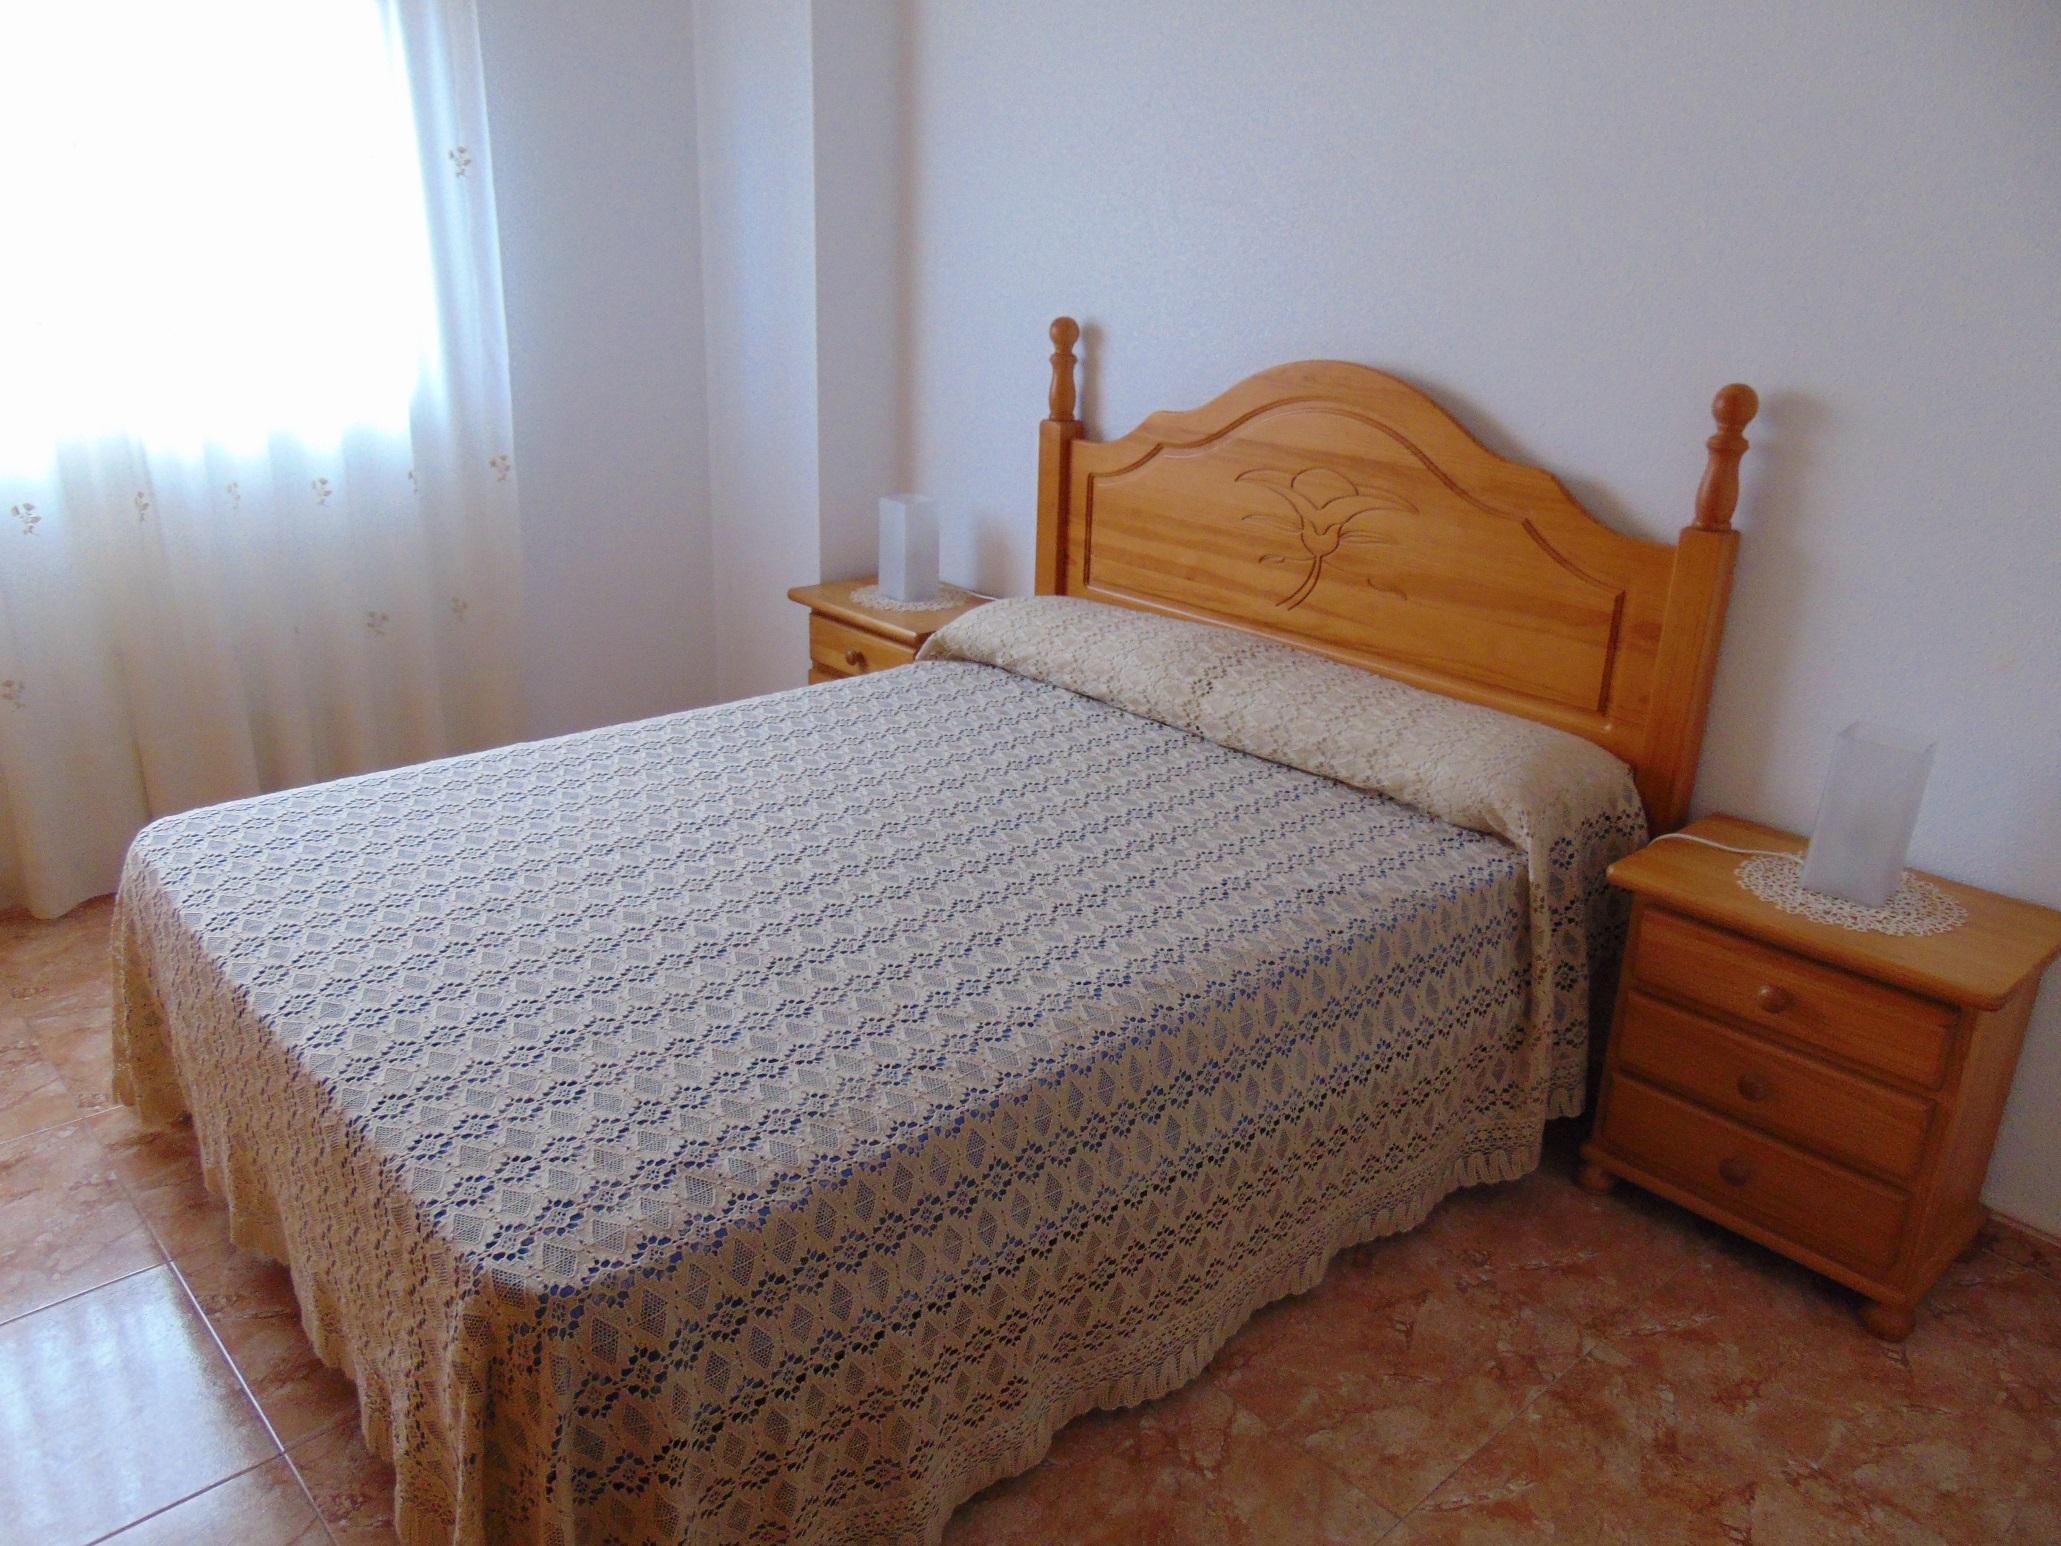 Propery For Sale in San Pedro del Pinatar, Spain image 3